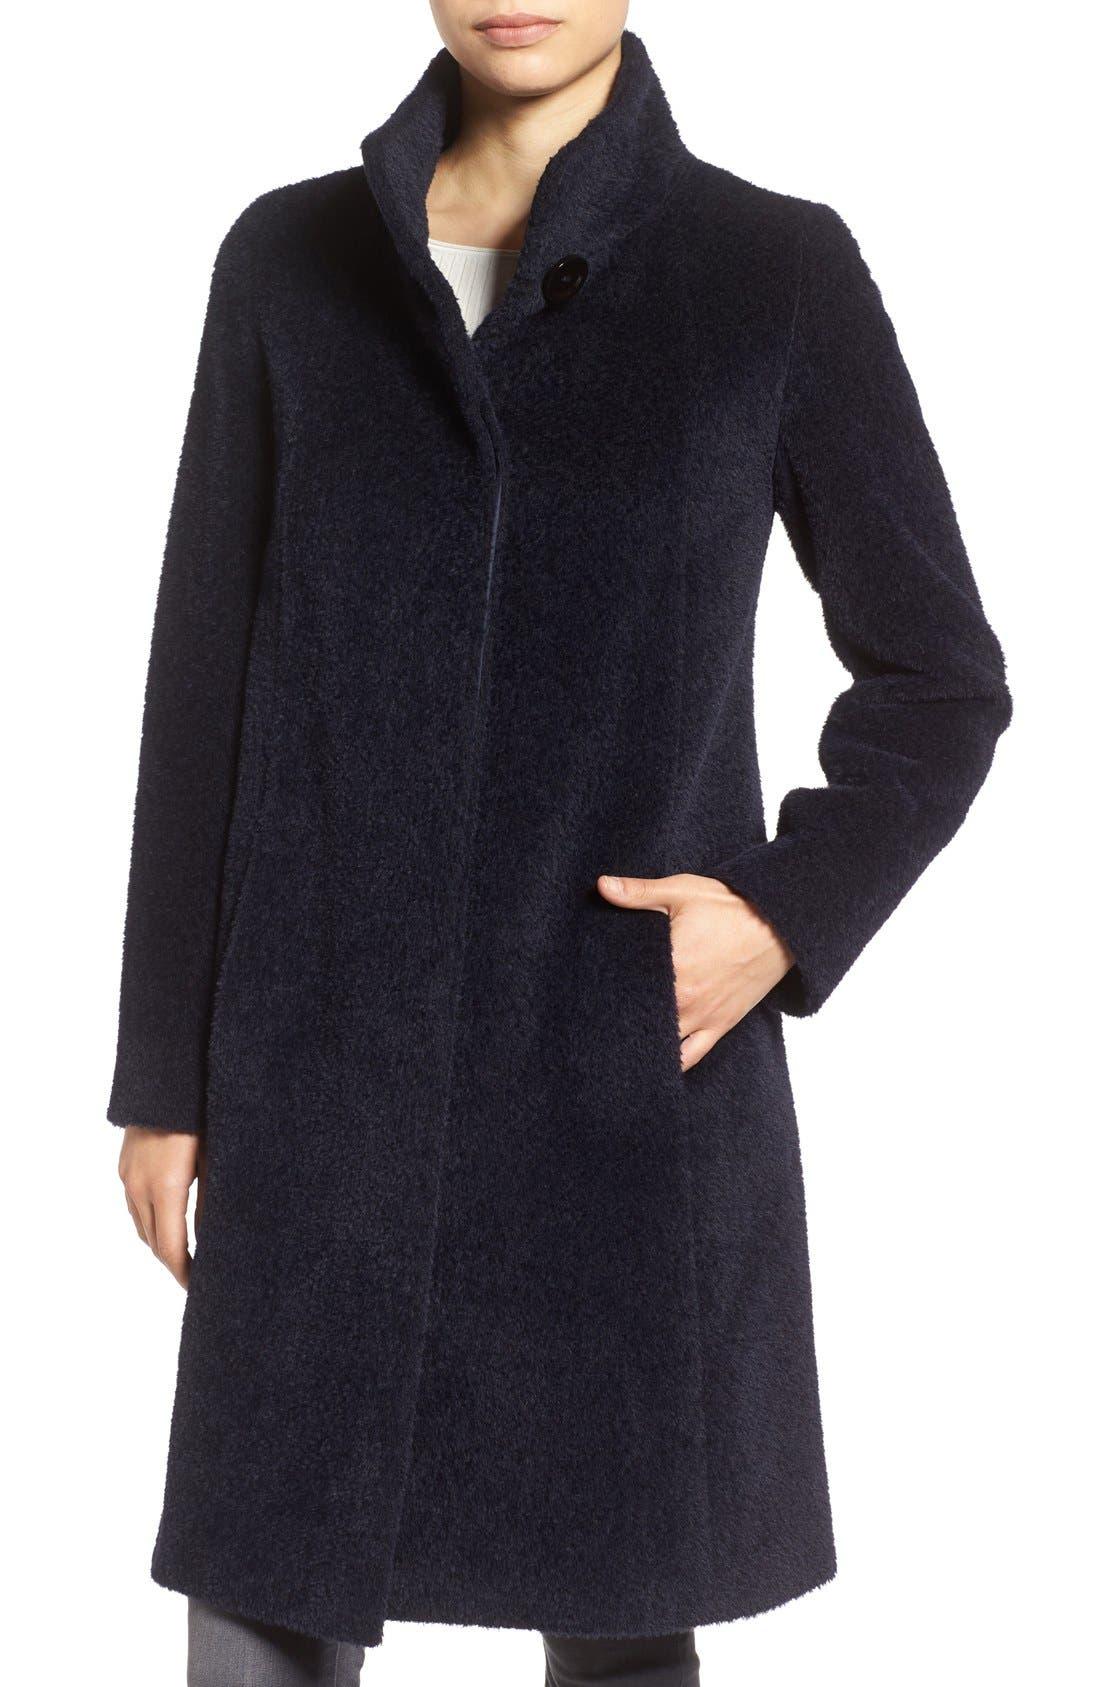 Main Image - Cinzia Rocca Icons Stand Collar Wool & Alpaca Long A-Line Coat (Regular & Petite)